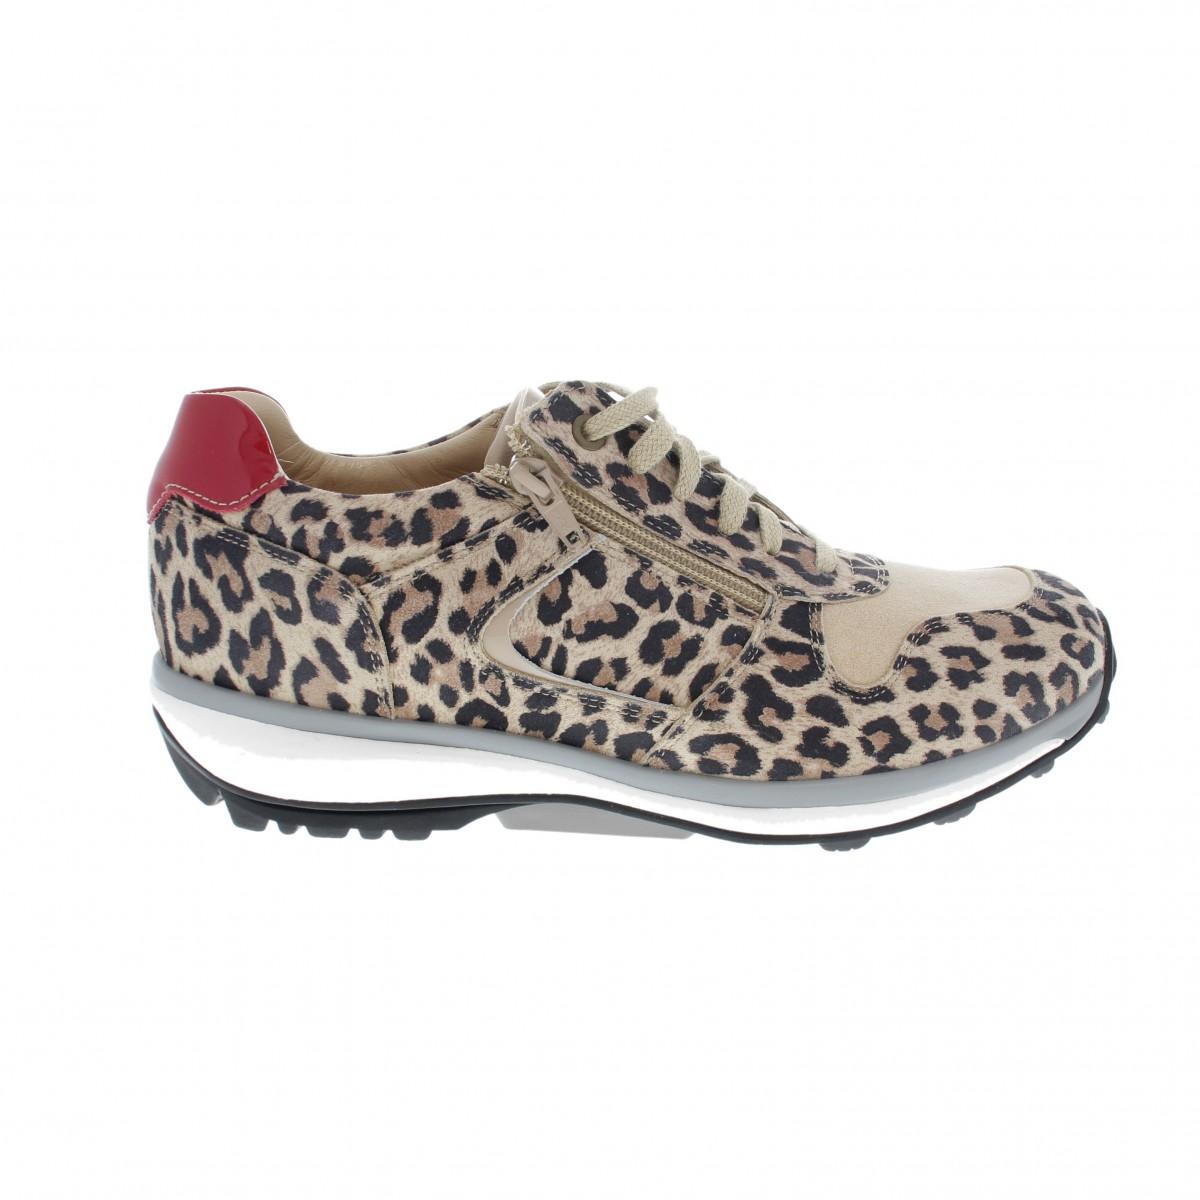 xsensible-stretchwalker-jersey-luipaardprint